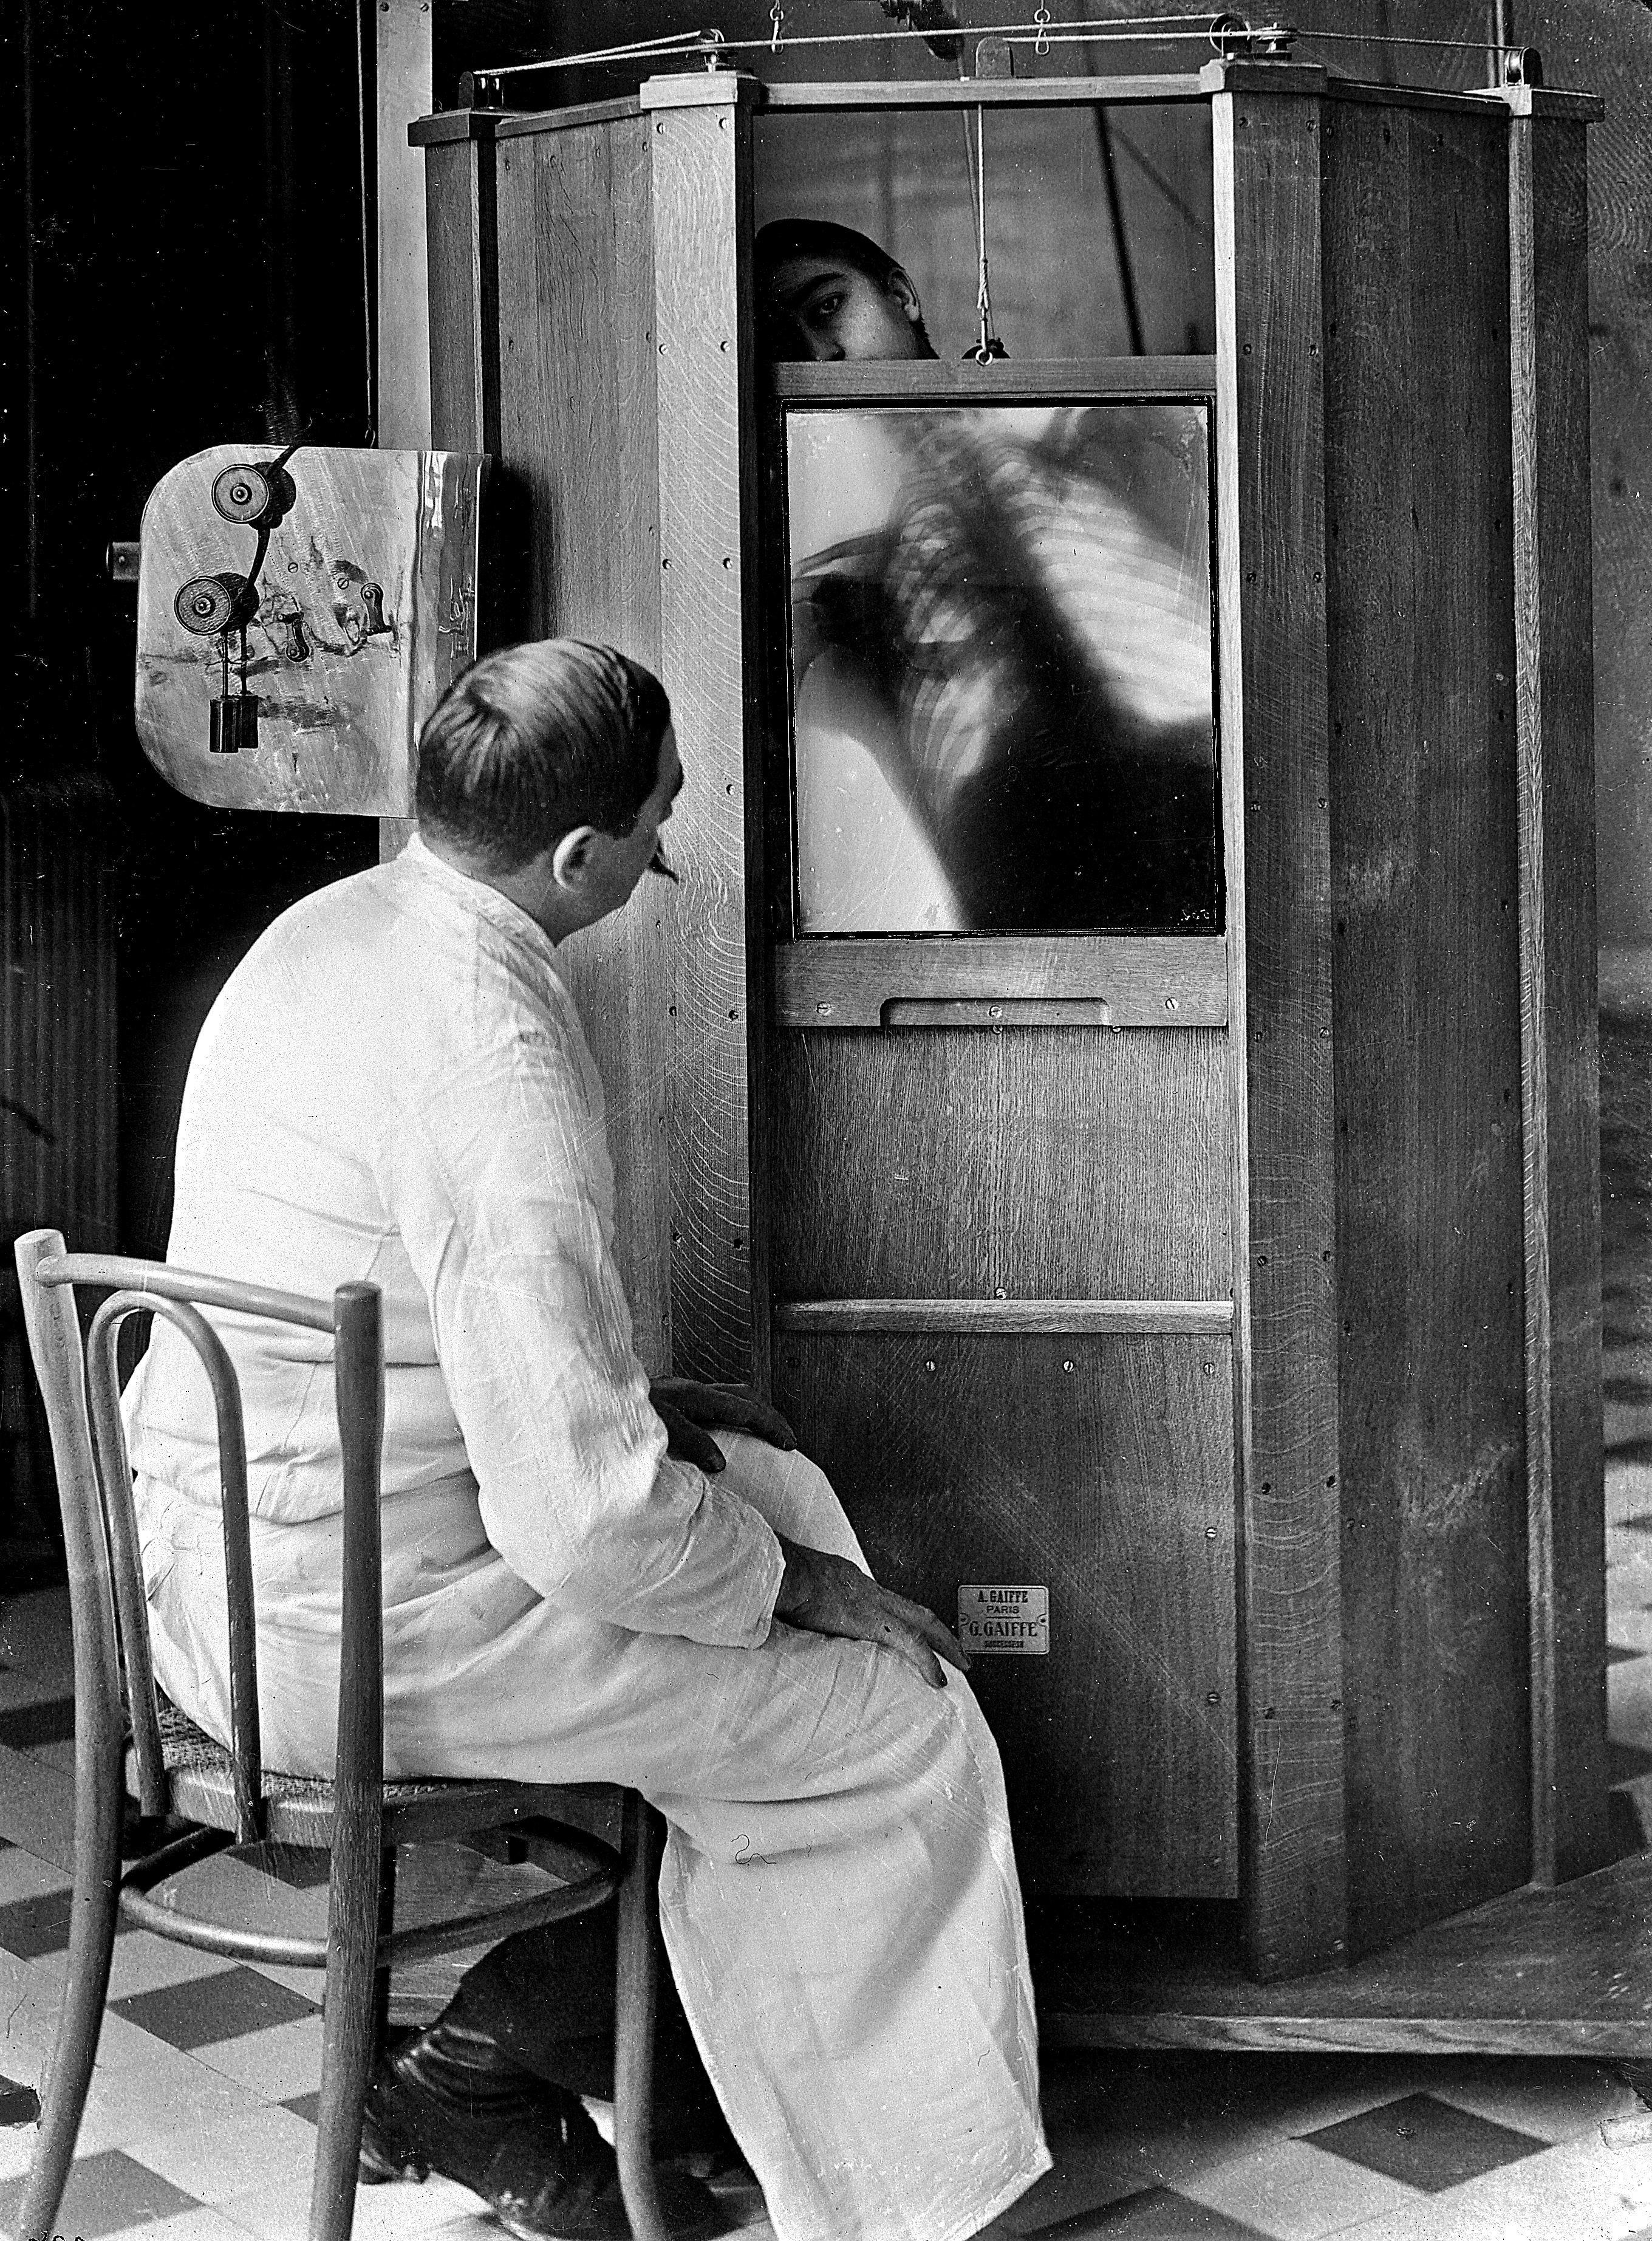 A chest X-ray in progress at Professor Menard's radiology department at the Cochin hospital, Paris, circa 1914.